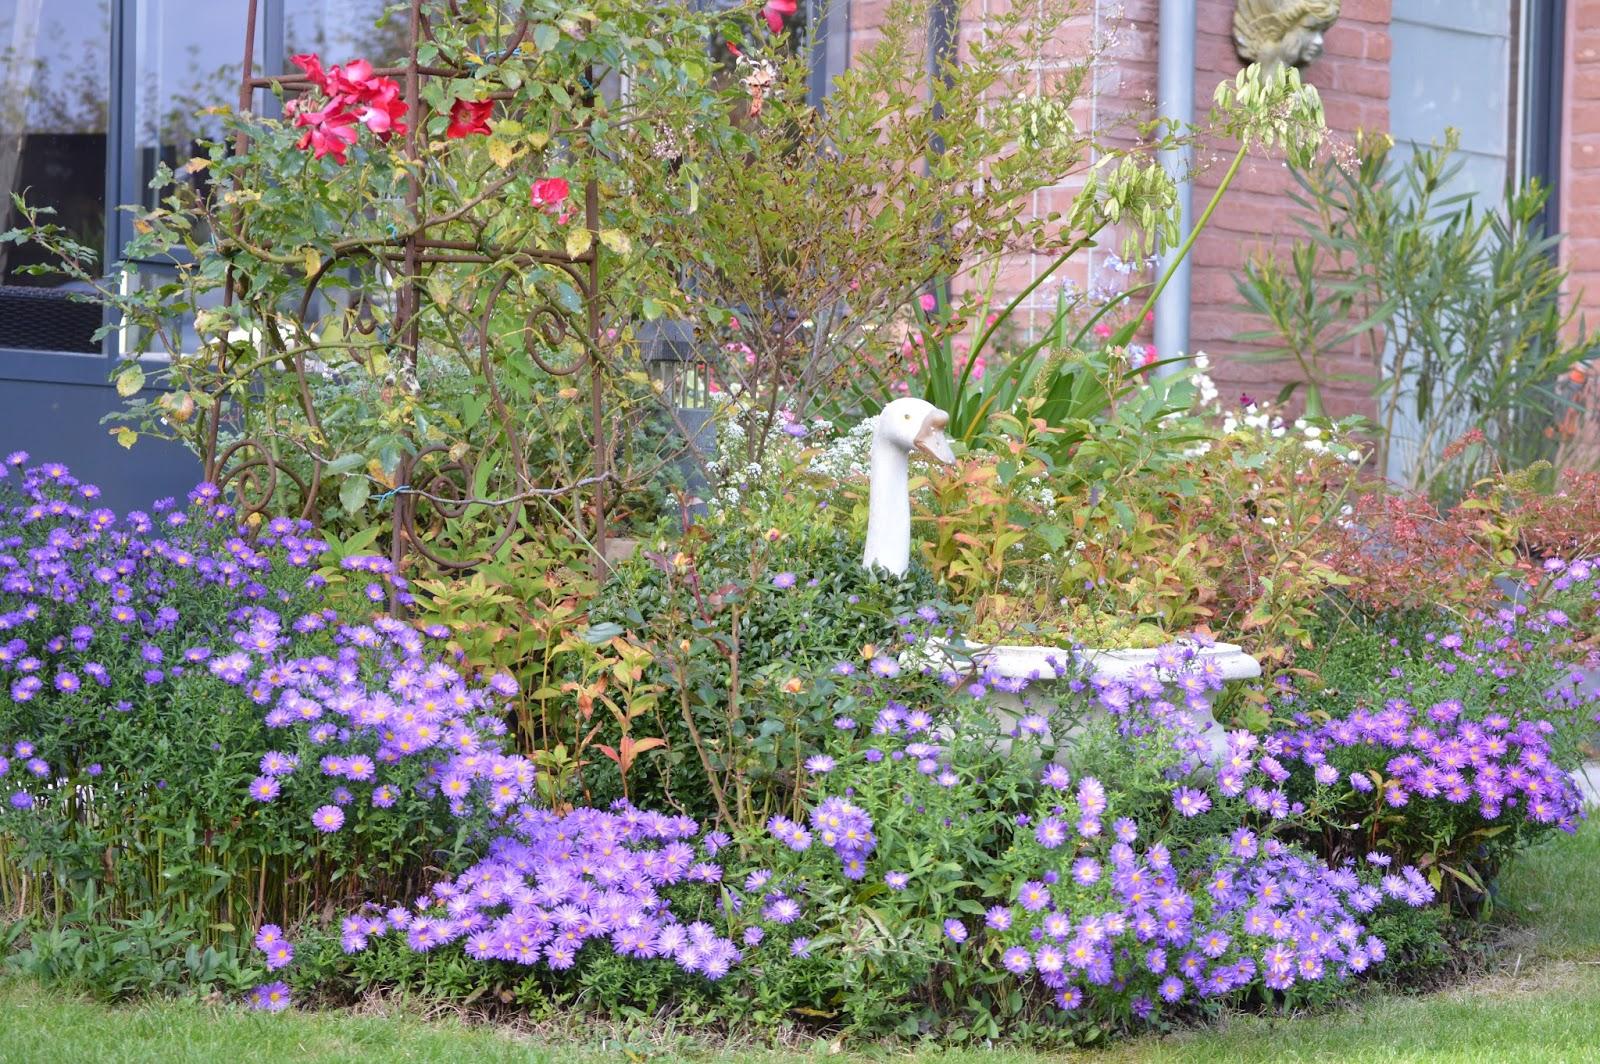 Passionn ment jardin octobre 2015 for Jardin octobre 2015